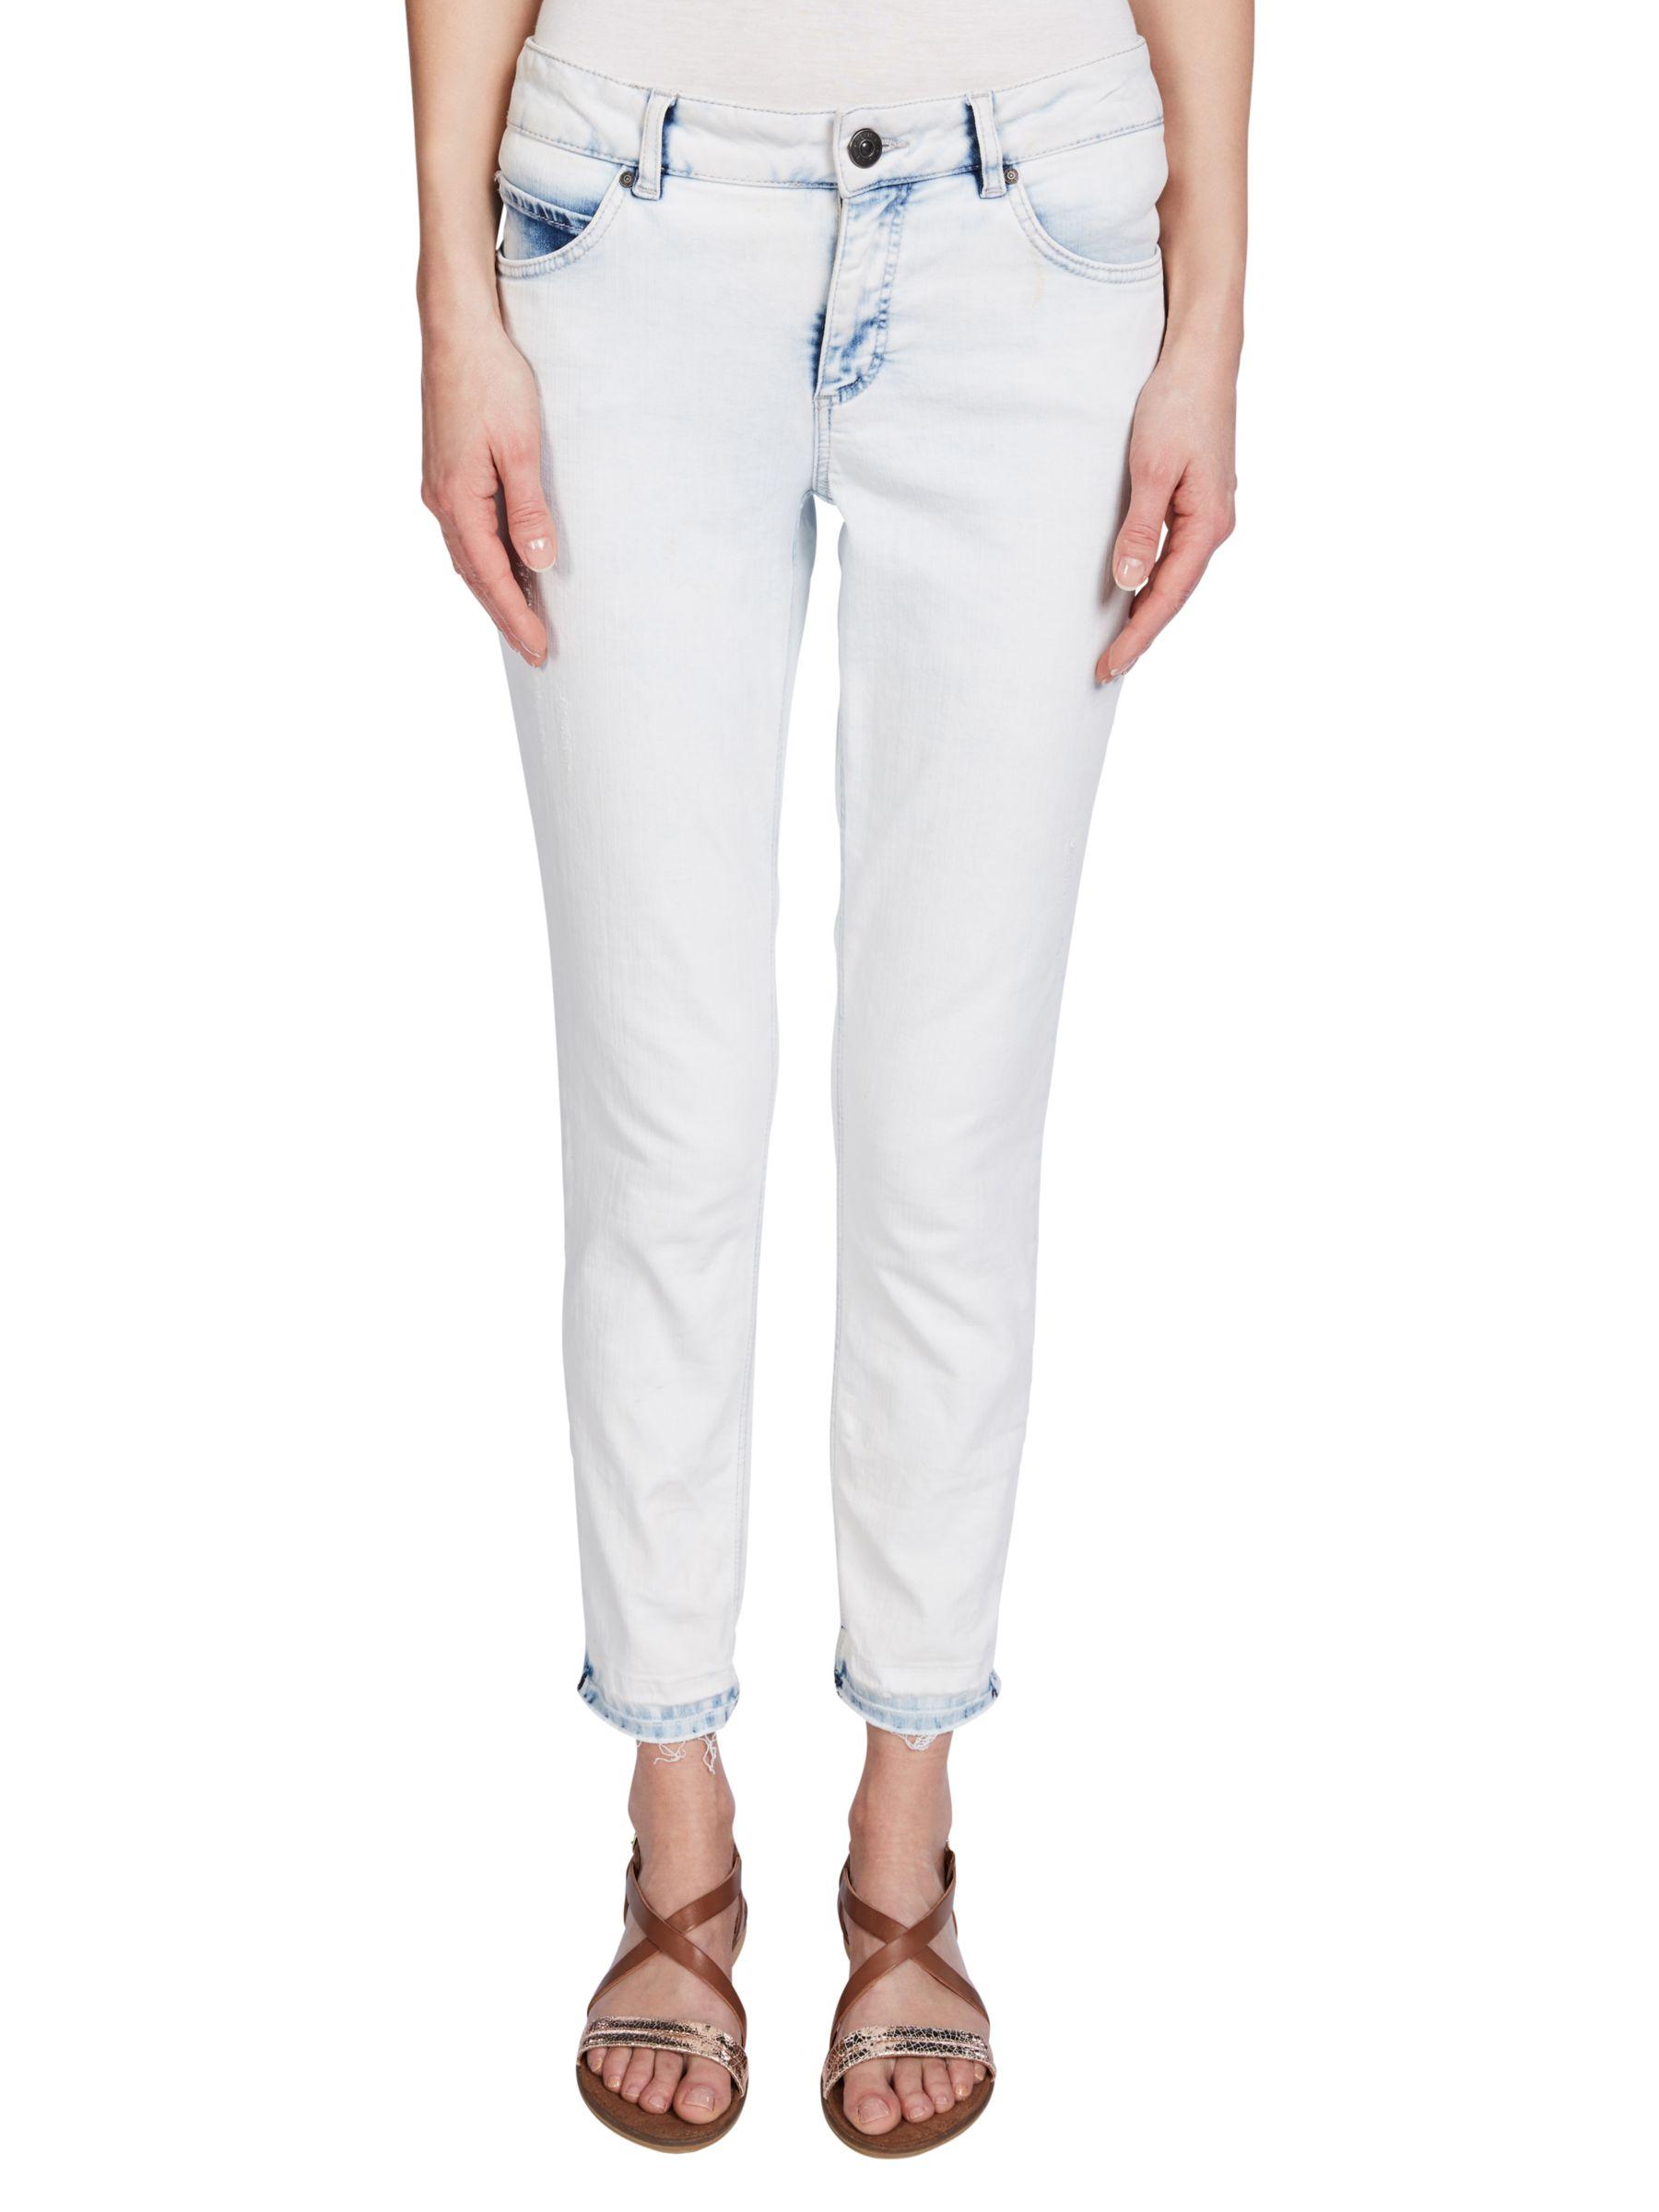 Oui Oui Denim Jeans, Light Blue